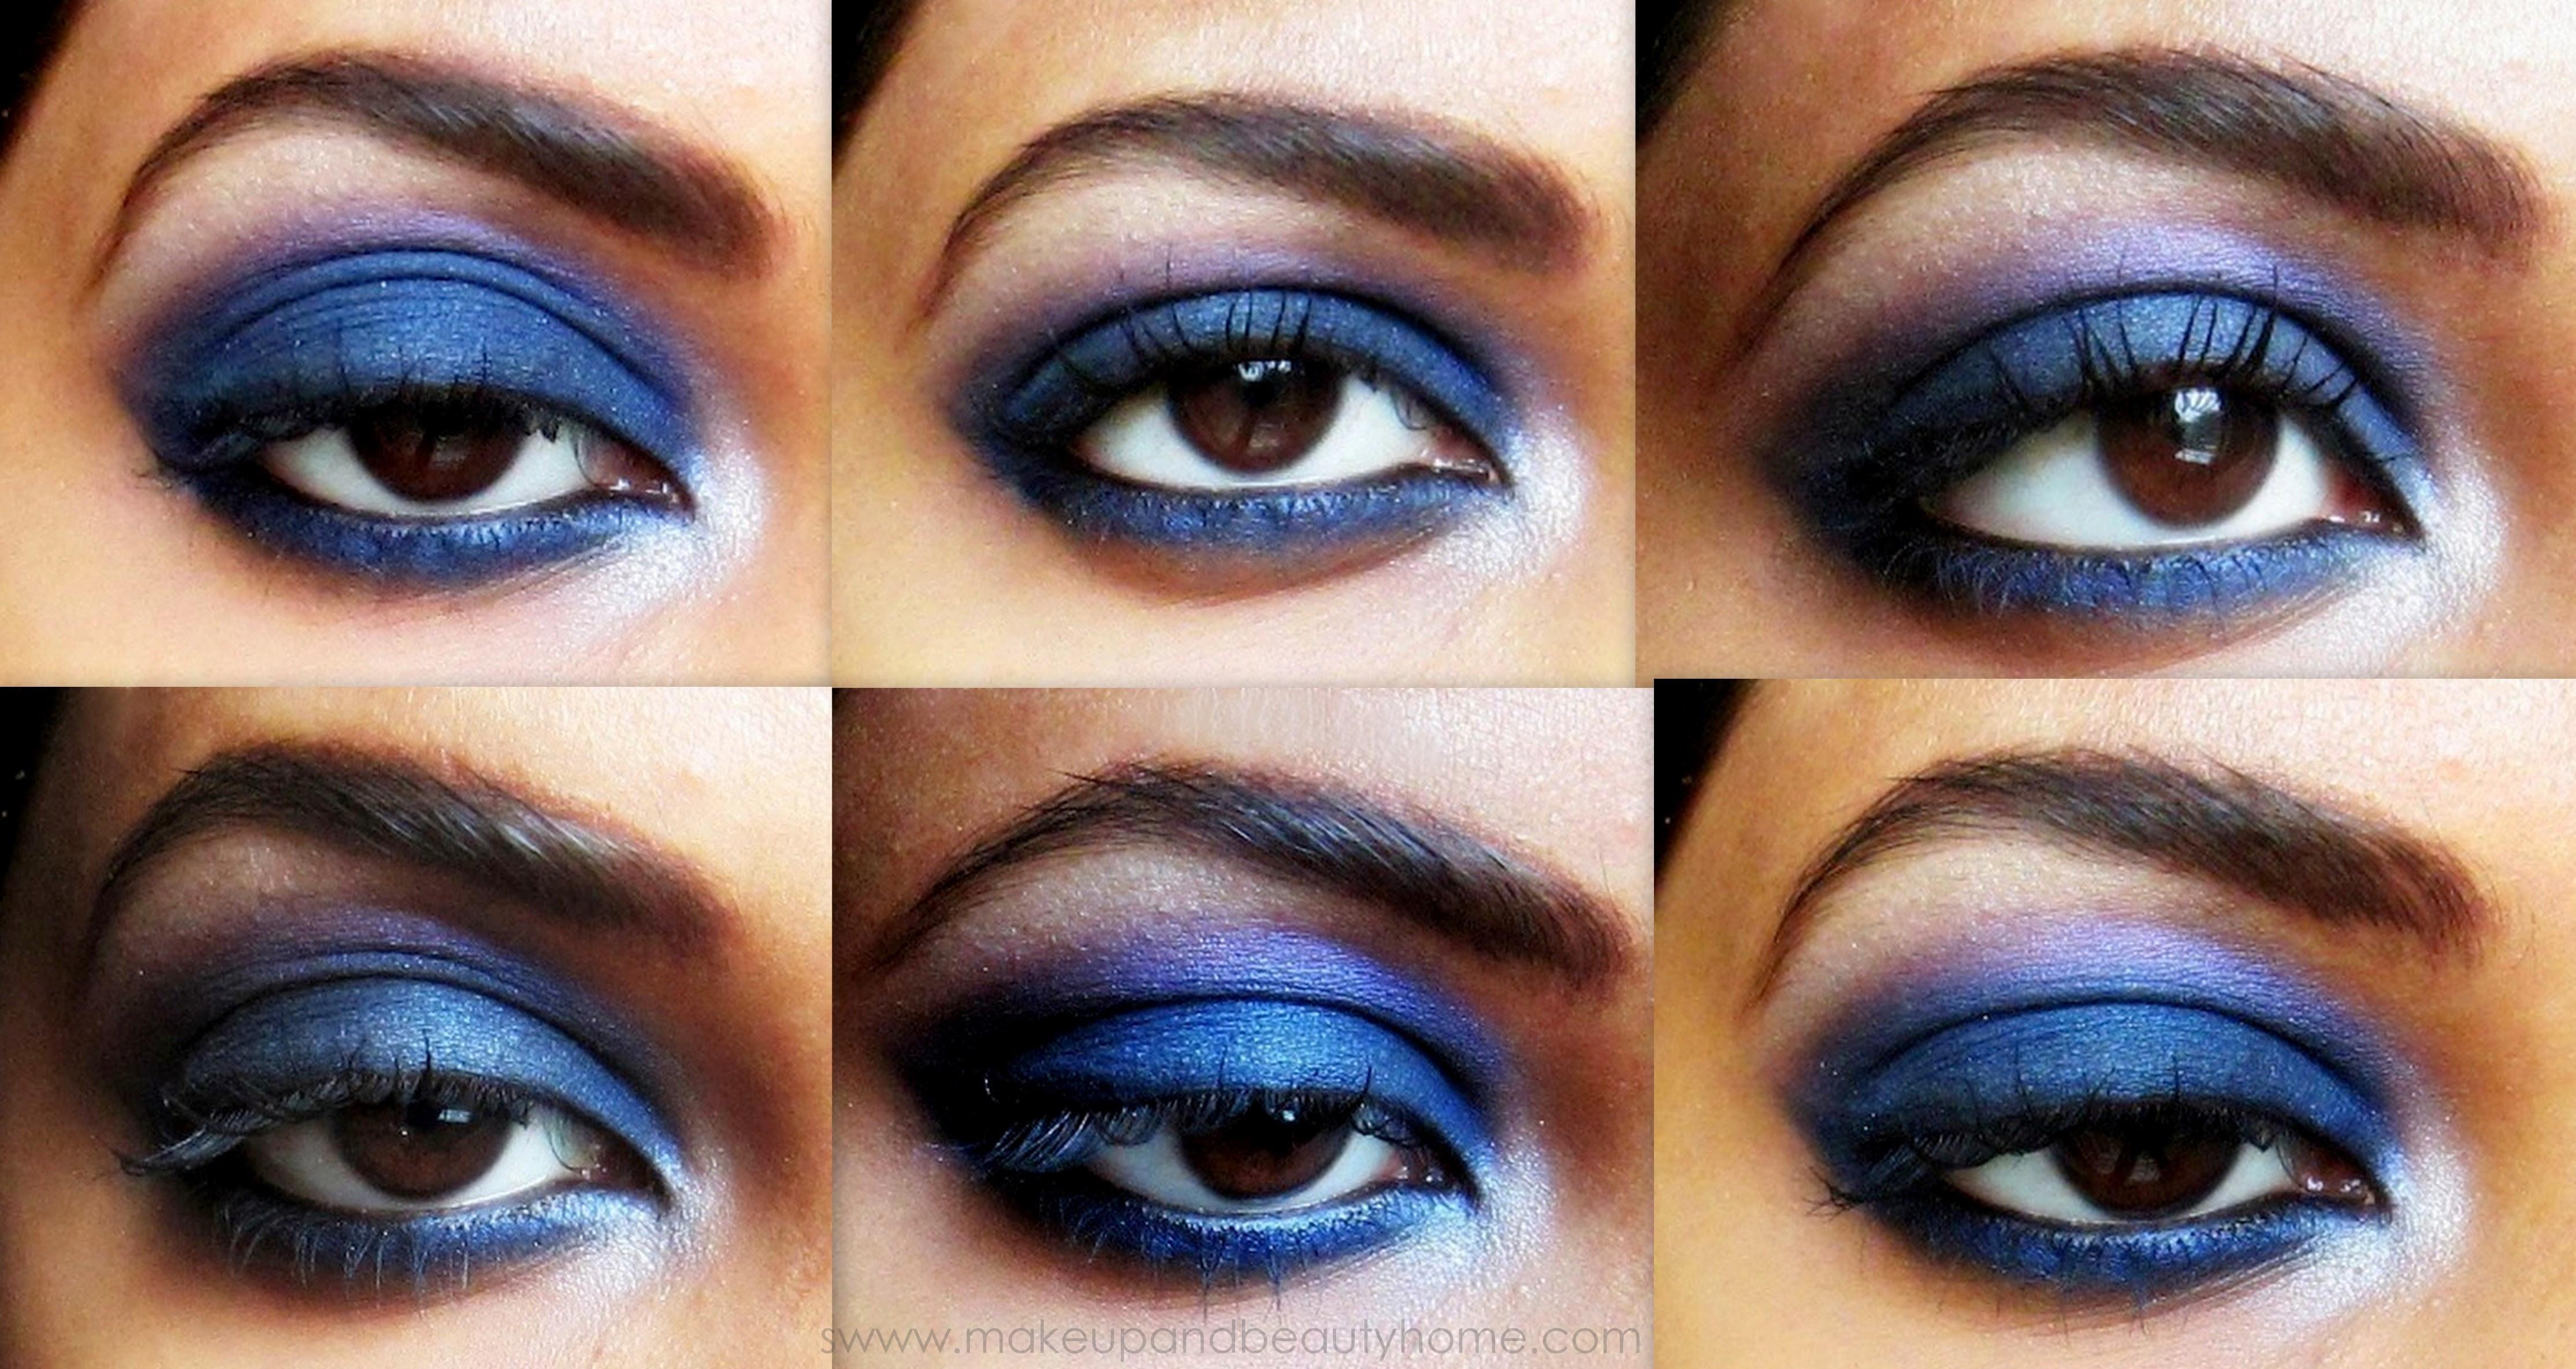 Intense Blue Smokey Eye Makeup - Step by Step Tutorial ...